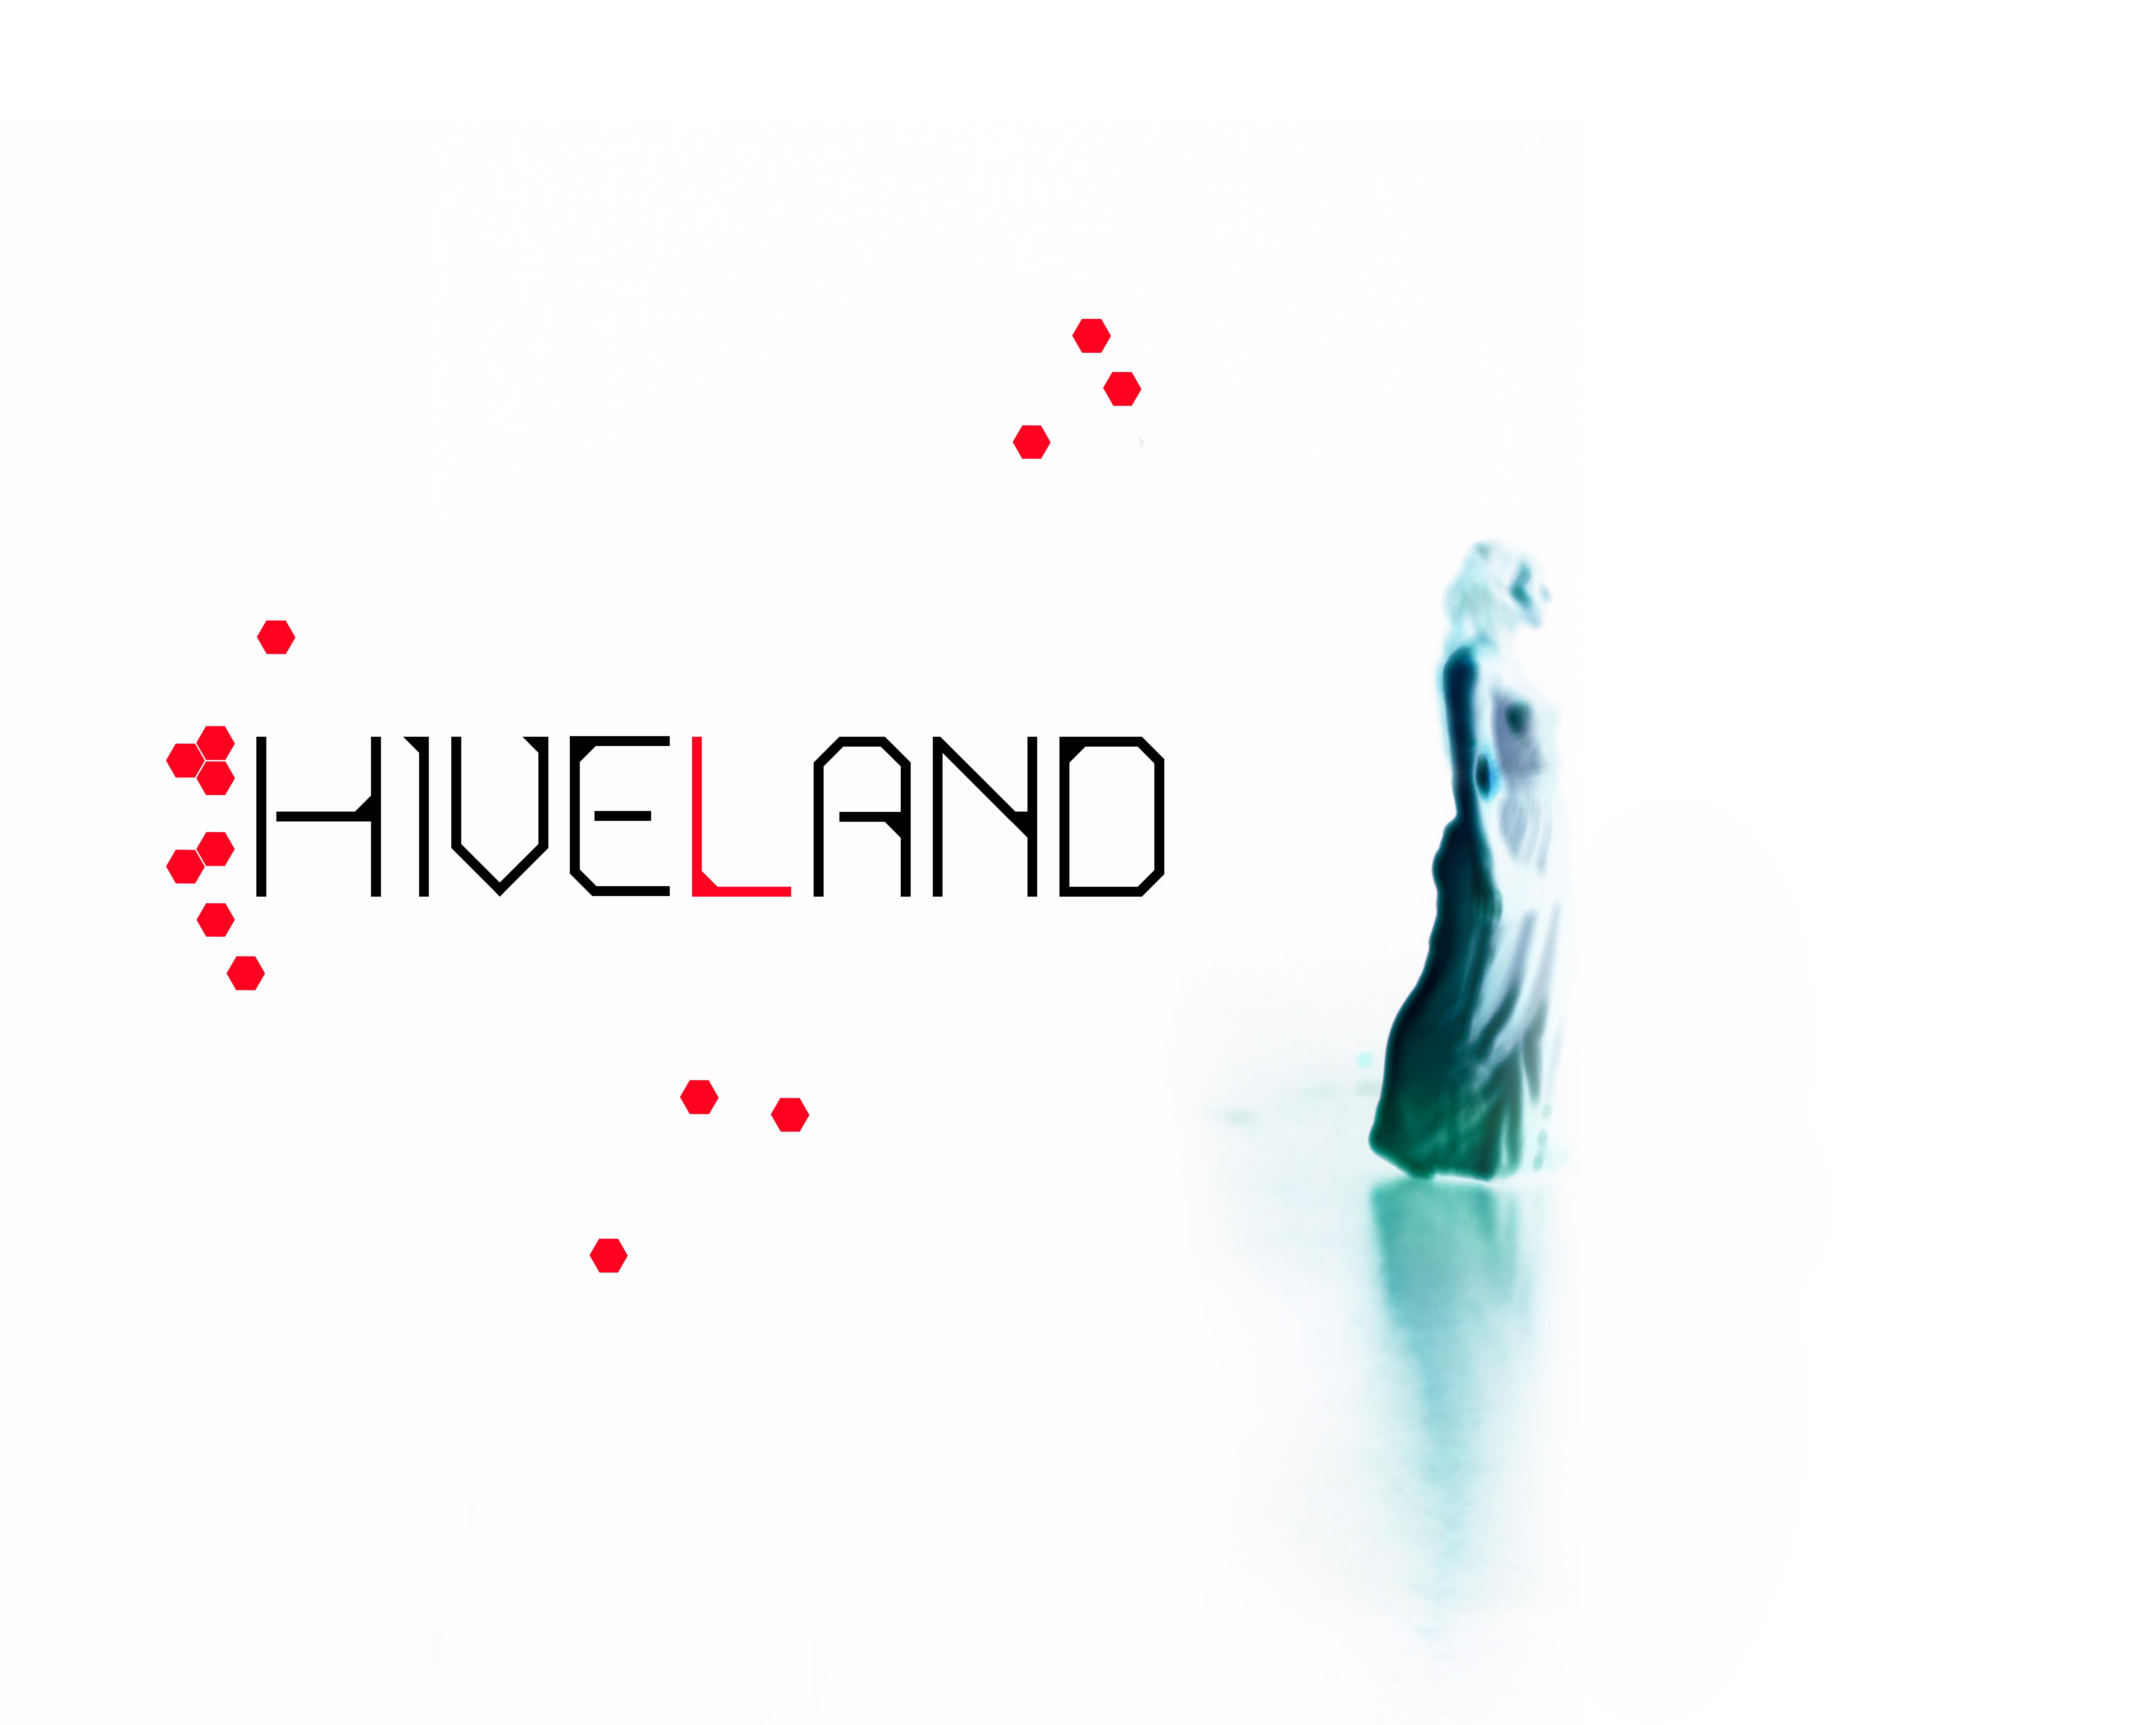 HIVELAND